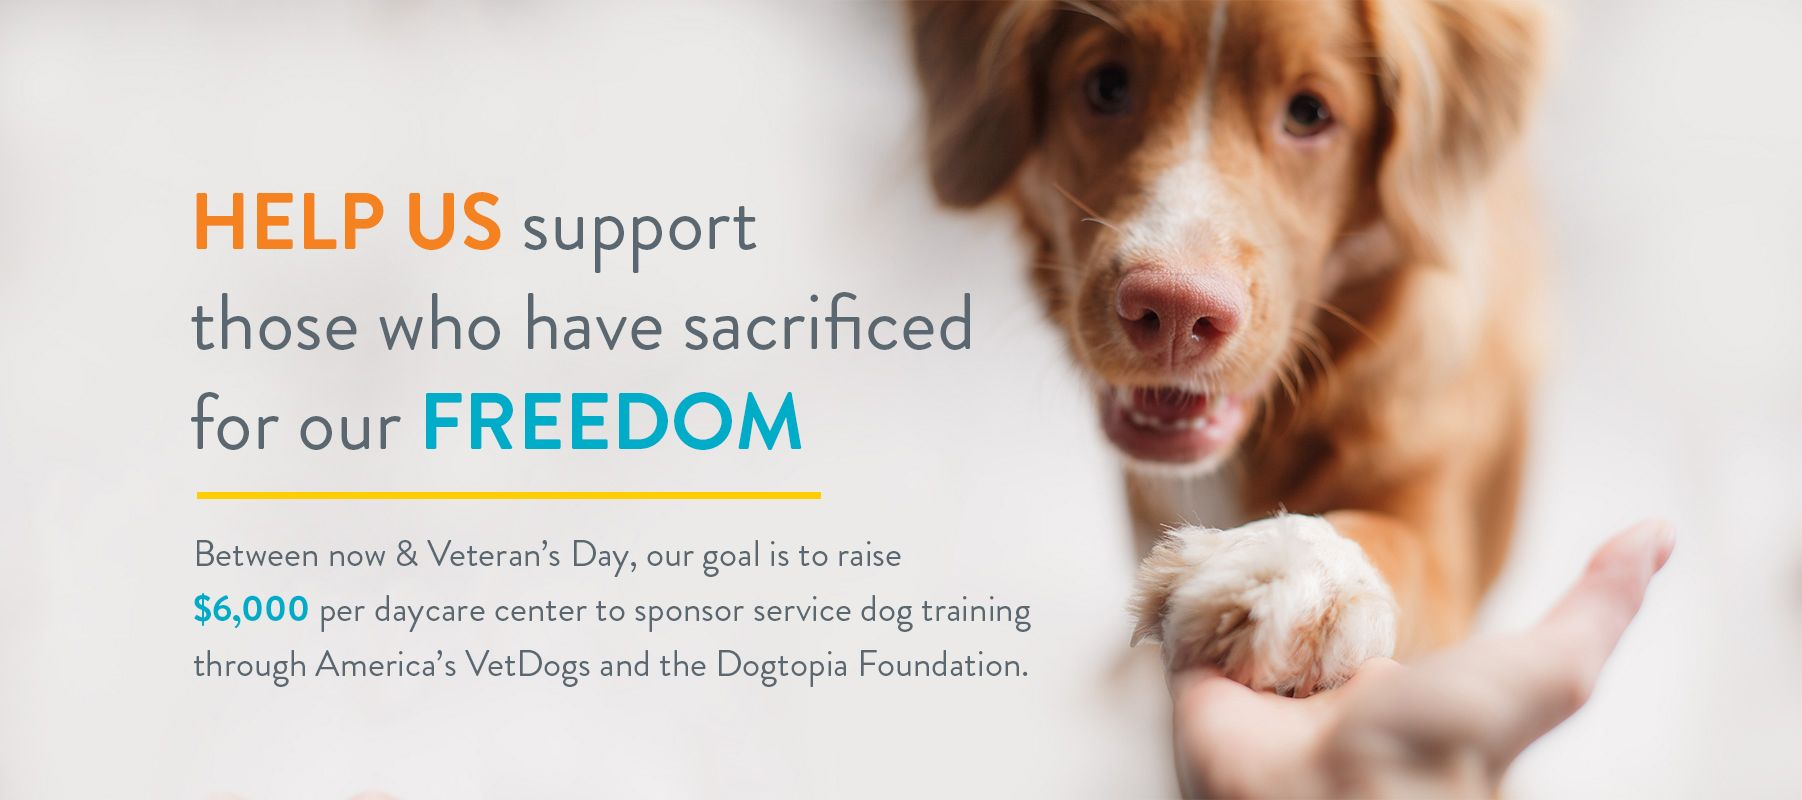 foundation hero image 6K in 6M Service dog training